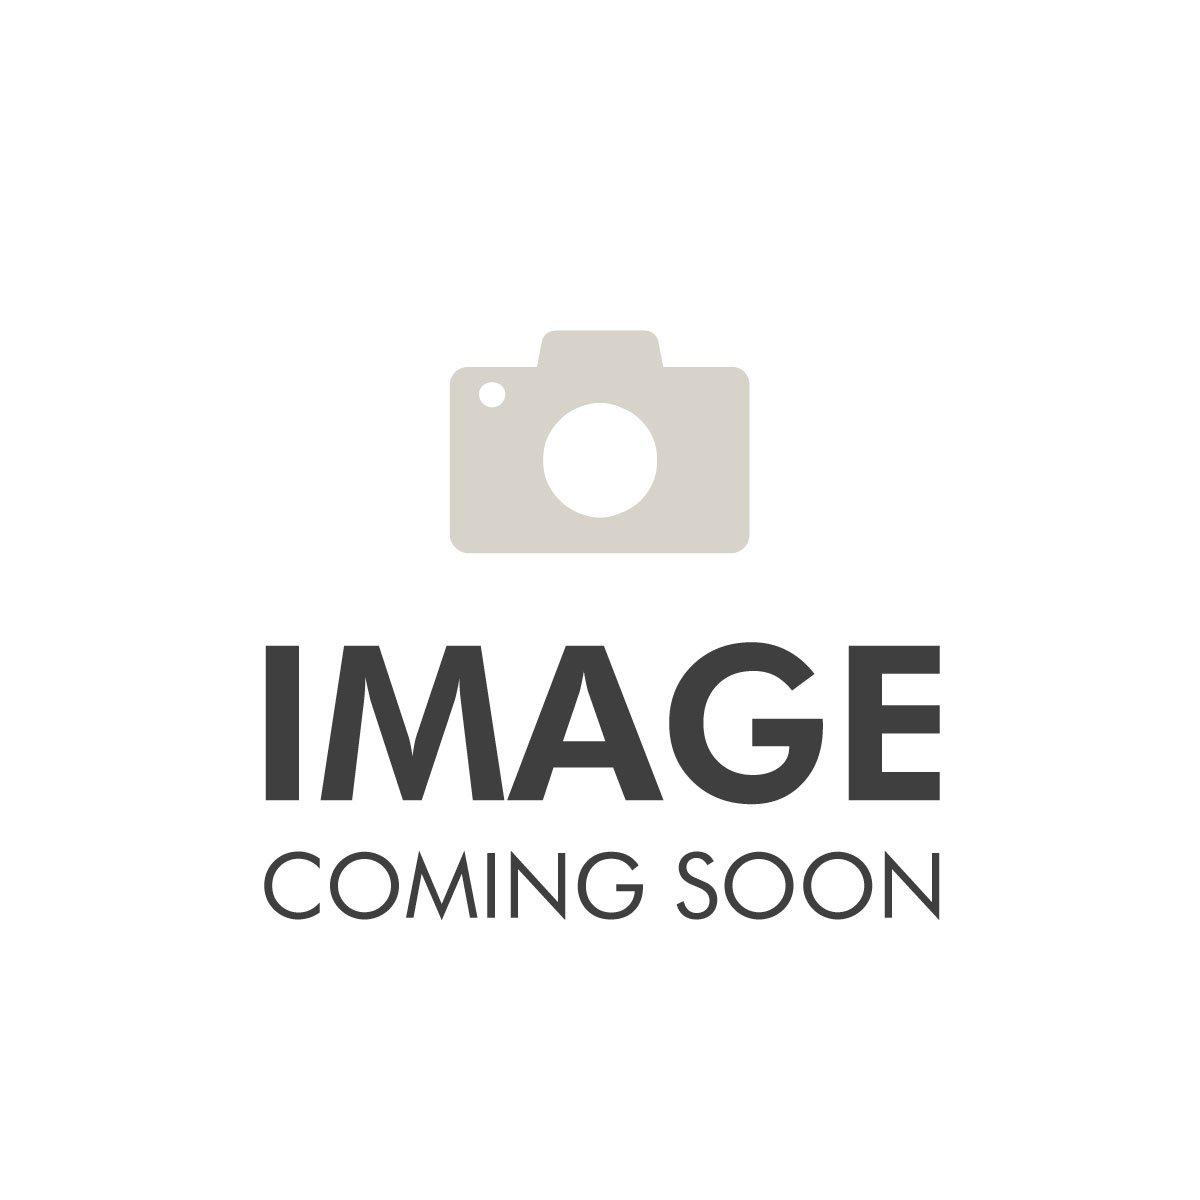 Leon Paul - Impact-Absorbing Sabre Pad